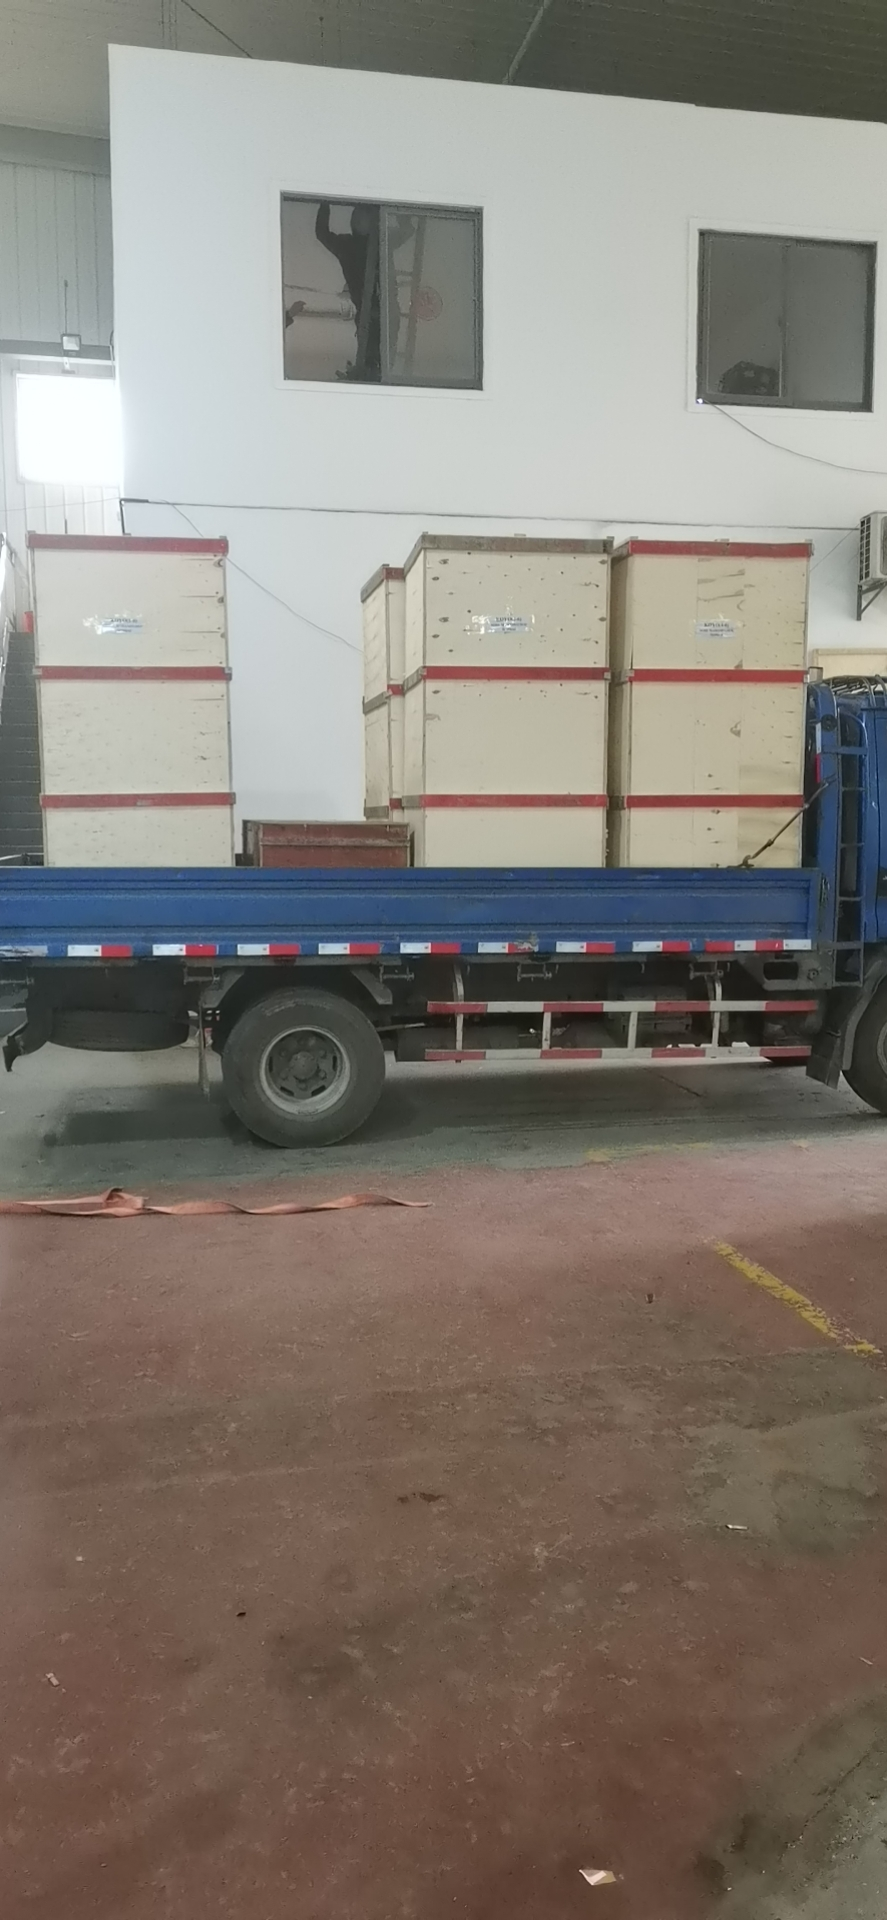 5 KOYO  sachet water packing machines sent to Guangzhou warehouse (for export to Liberia)